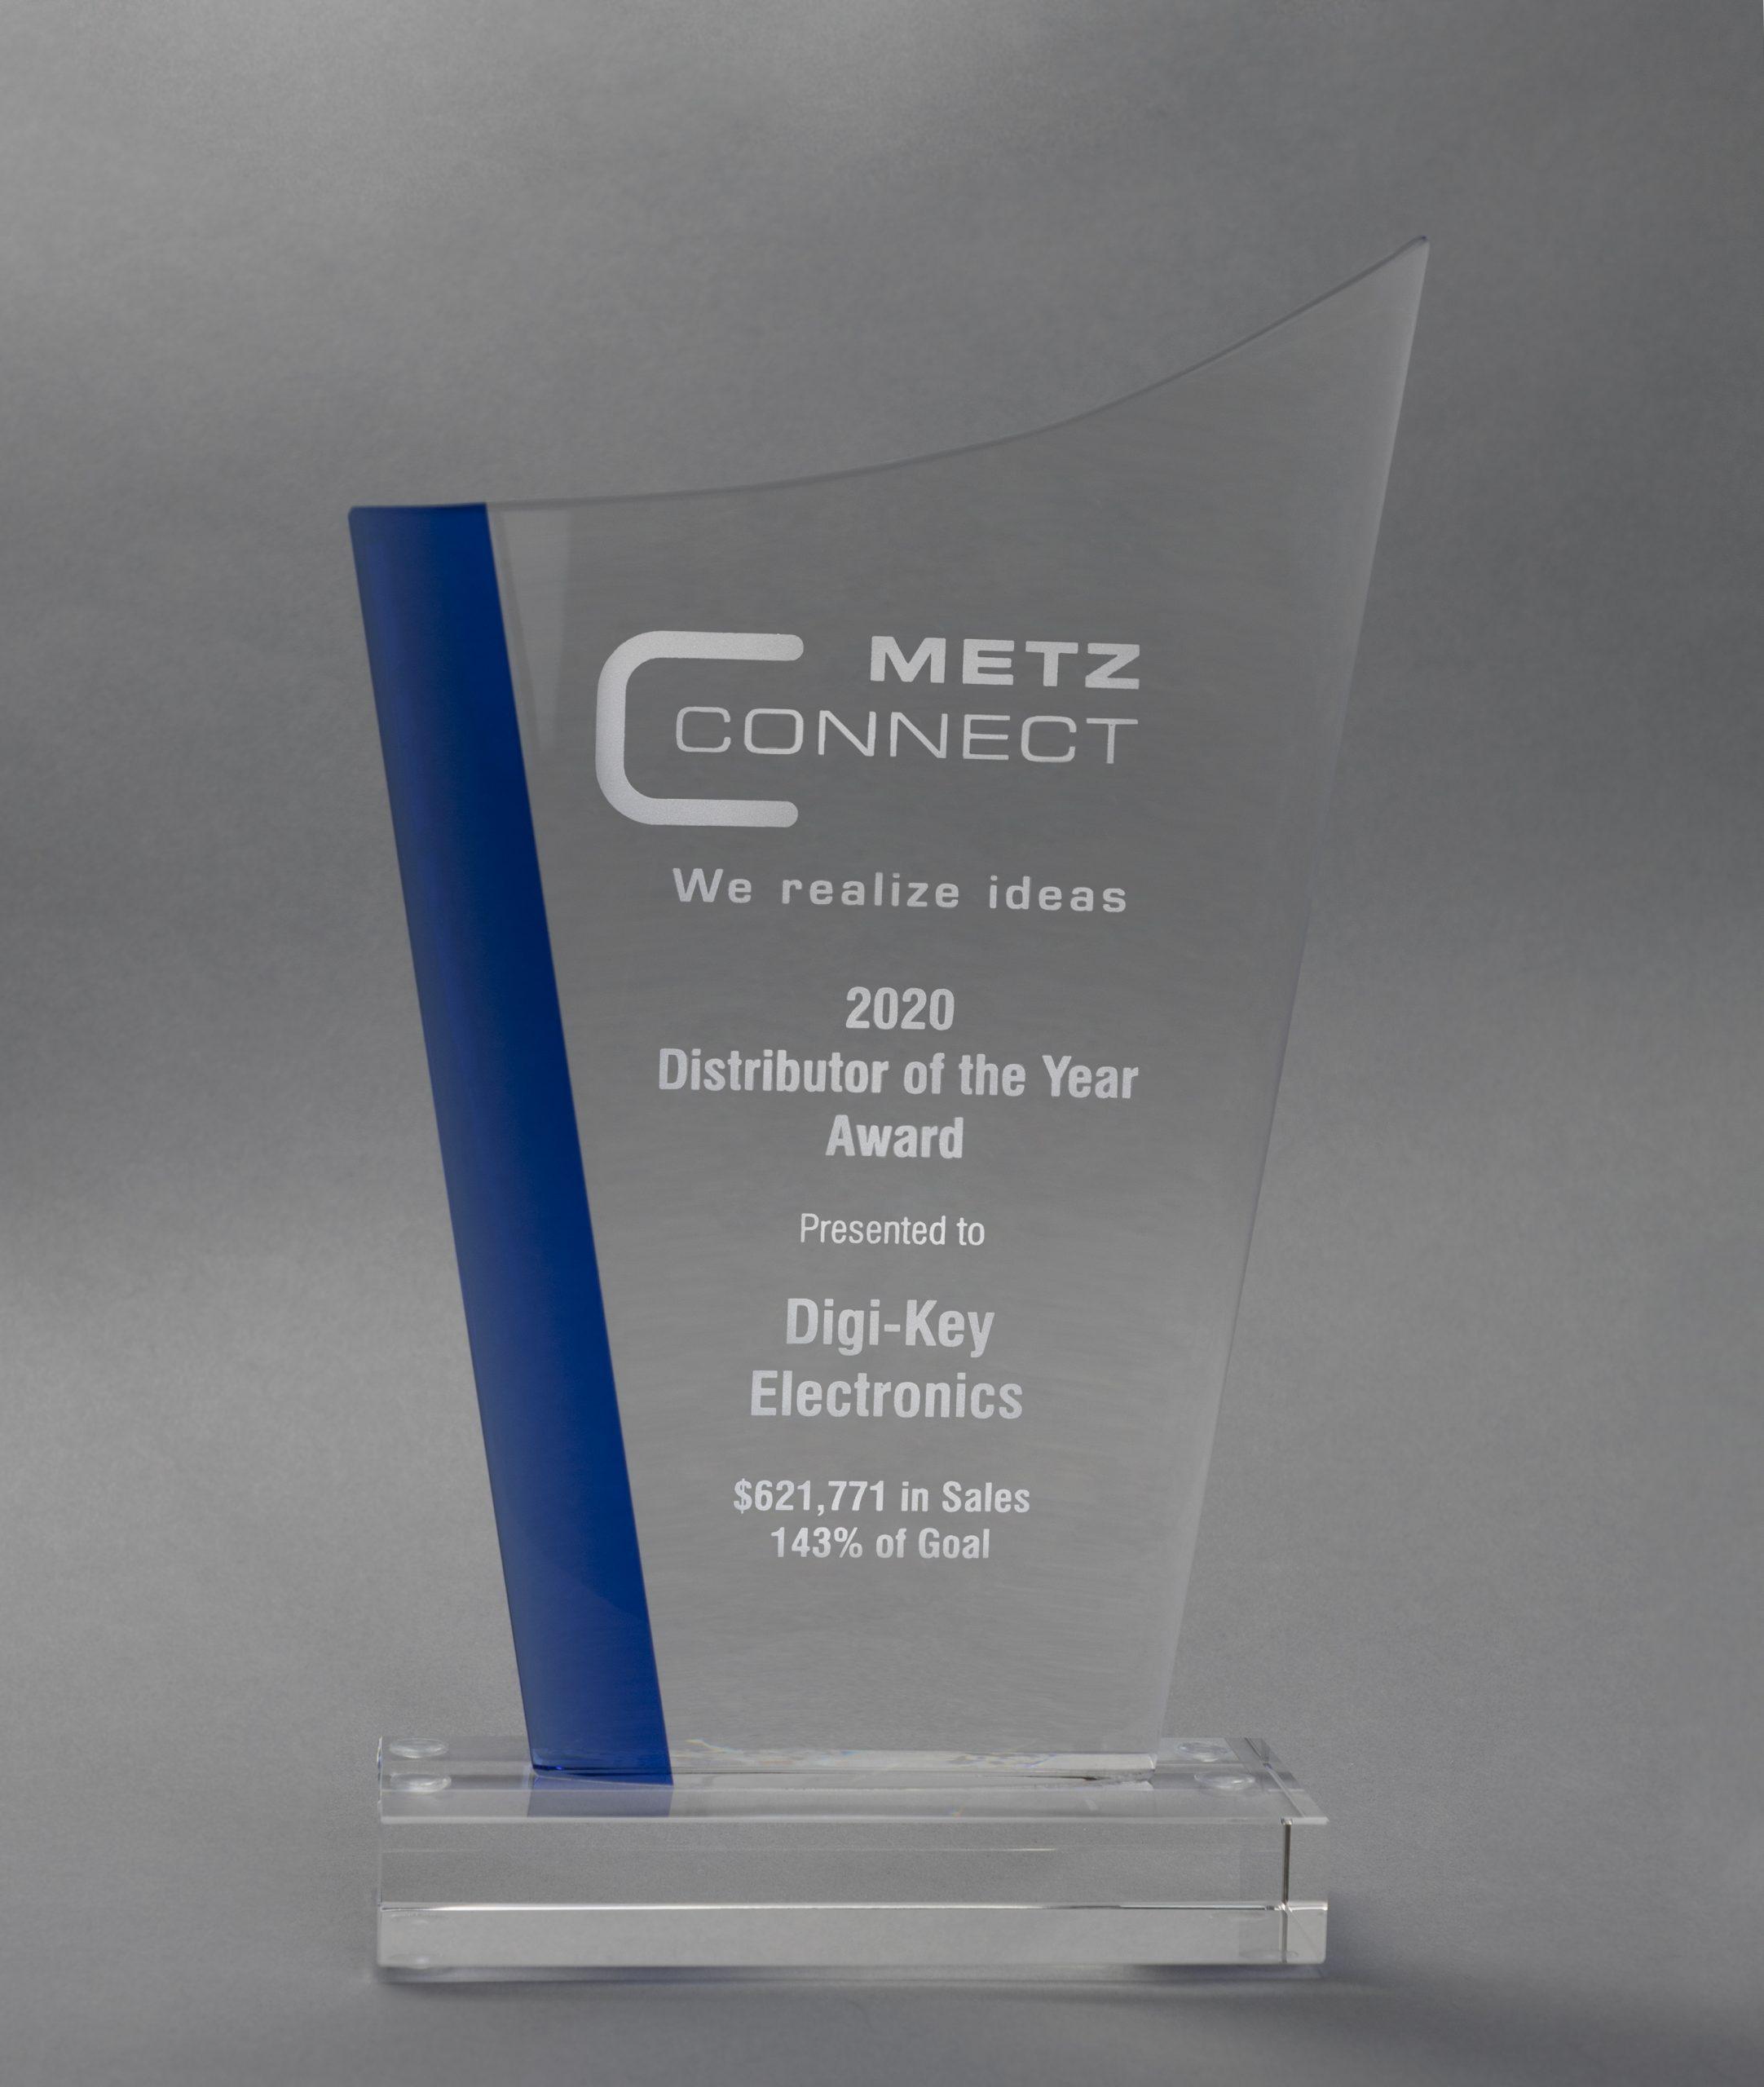 Digi-Key Electronics 获评 METZ CONNECT 年度分销商大奖